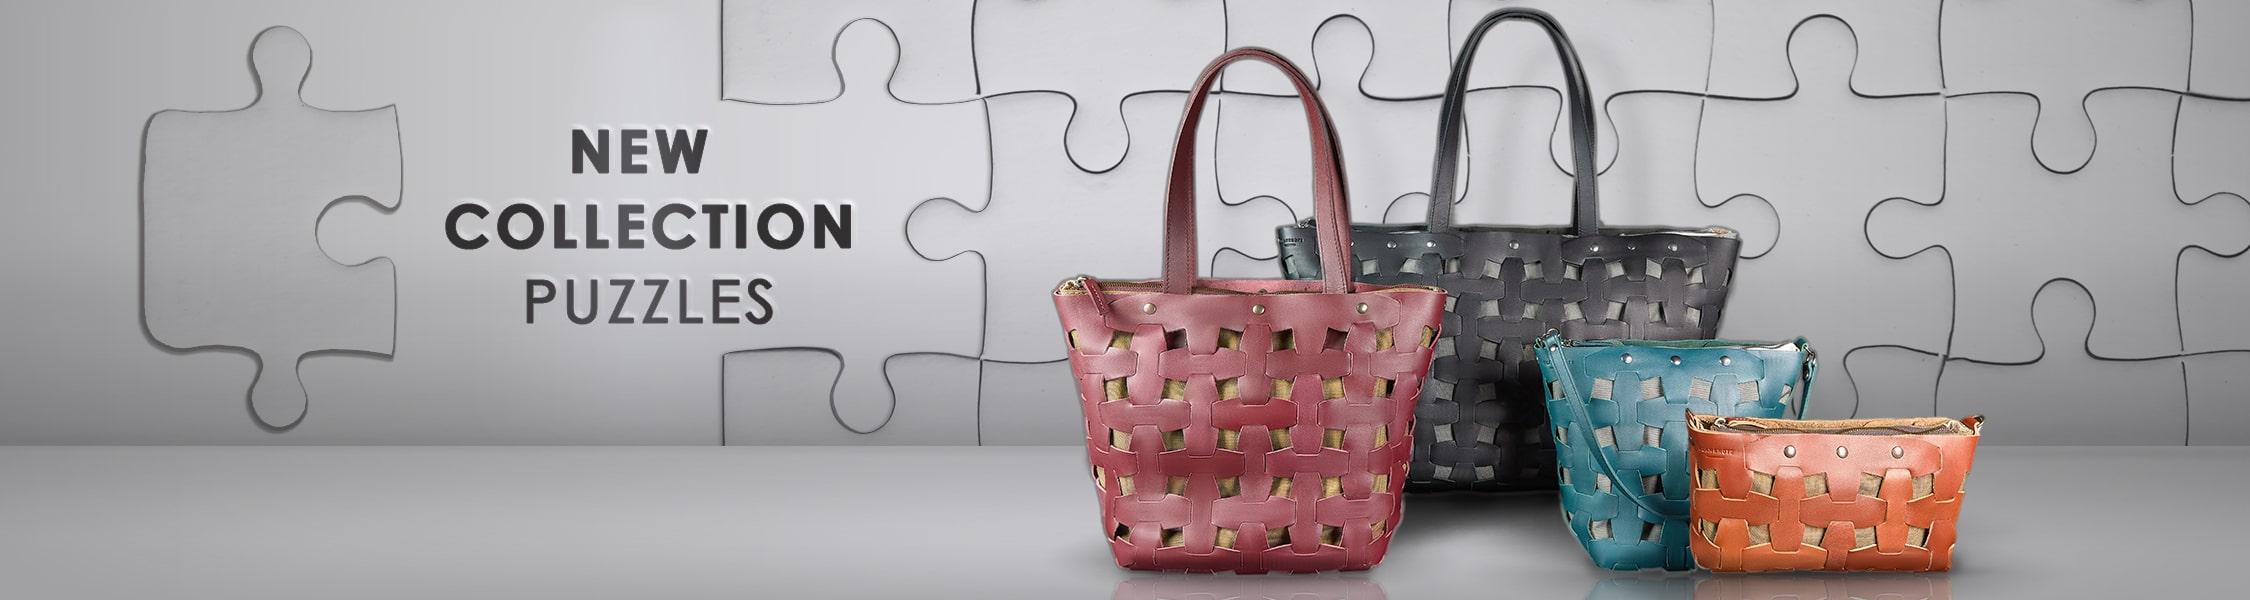 banner-puzzle